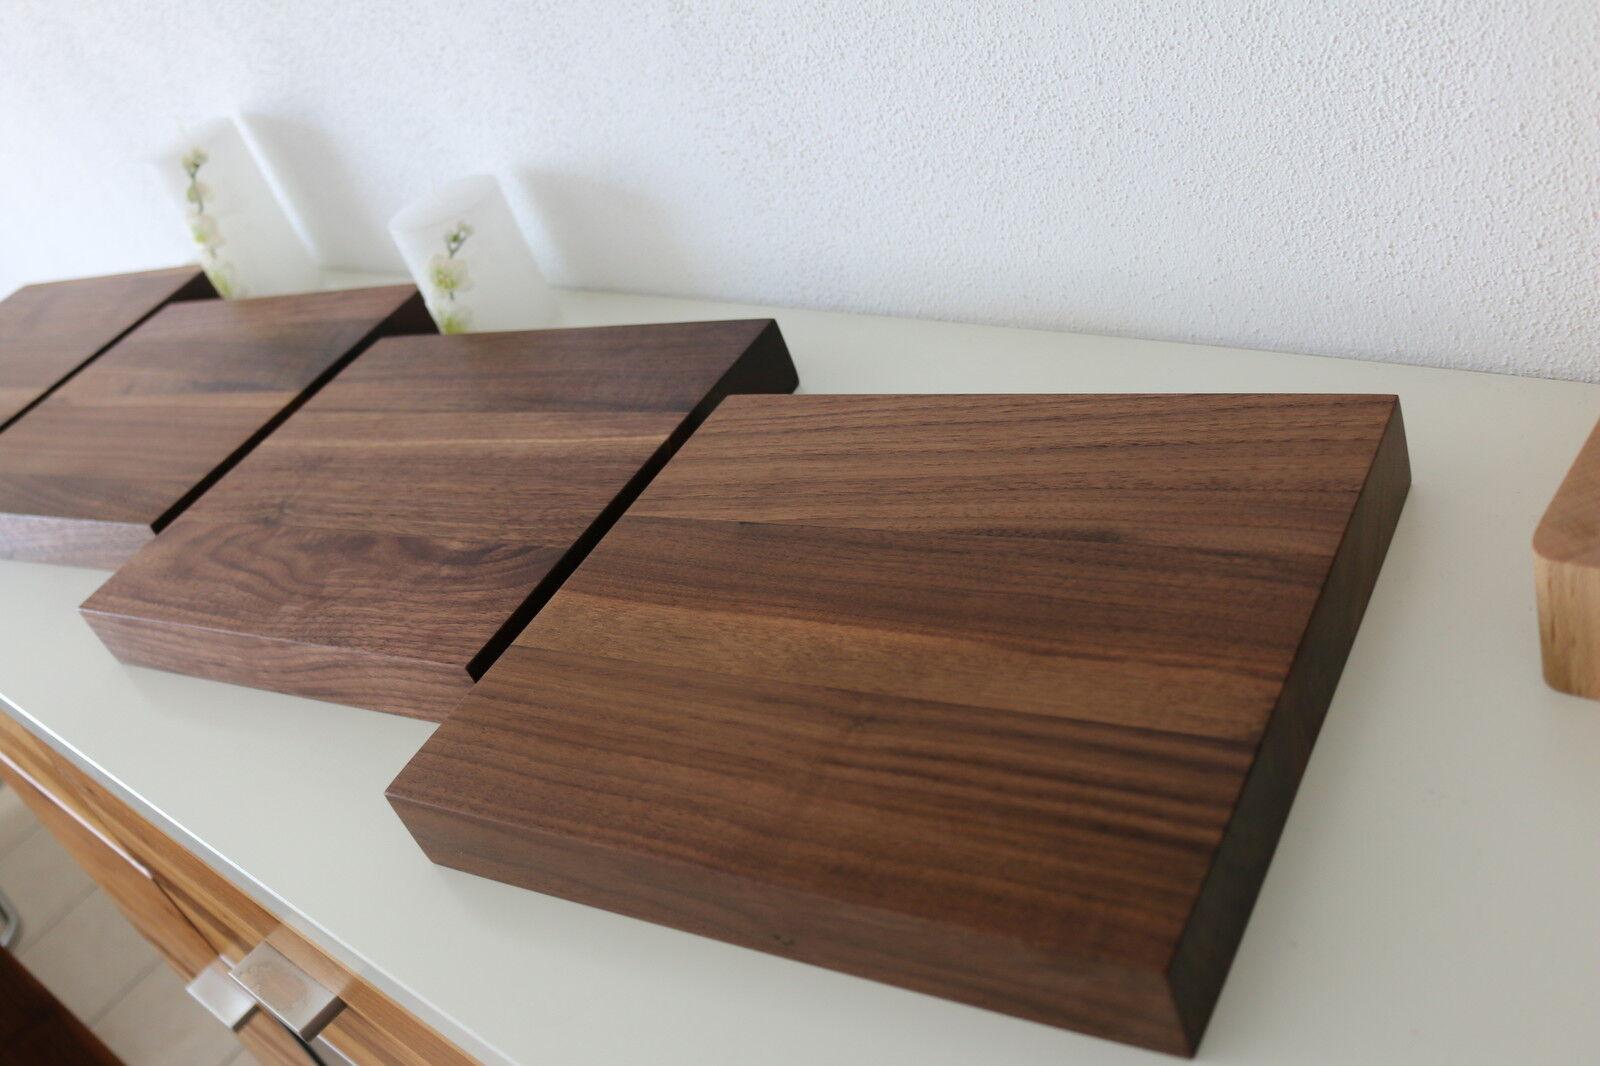 4x wandboard nussbaum massiv holz board regal steckboard regalbrett neu auf ma eur 245 00. Black Bedroom Furniture Sets. Home Design Ideas